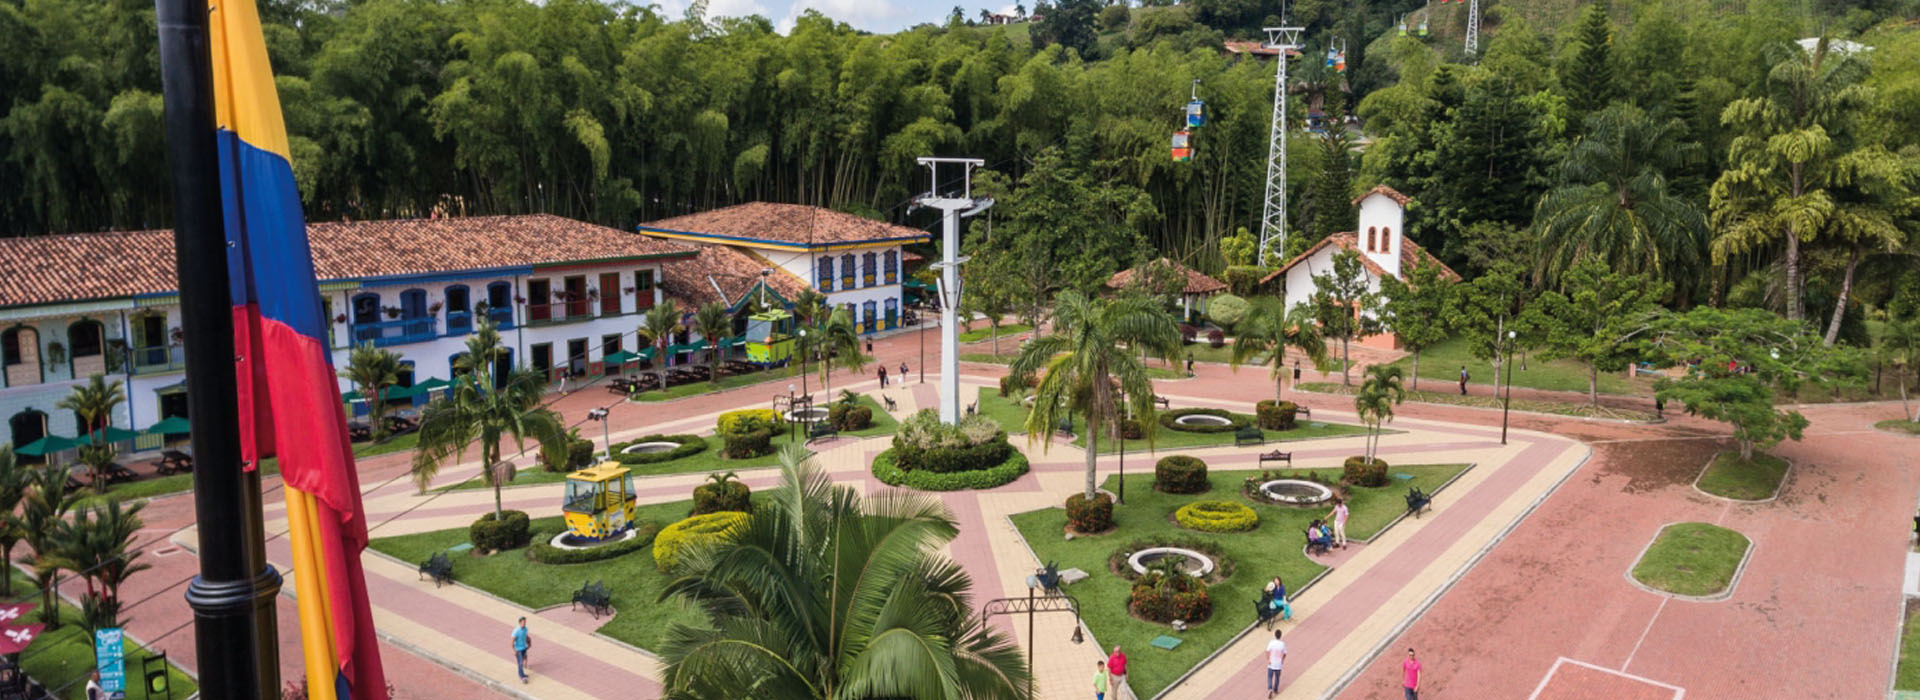 plaza-2